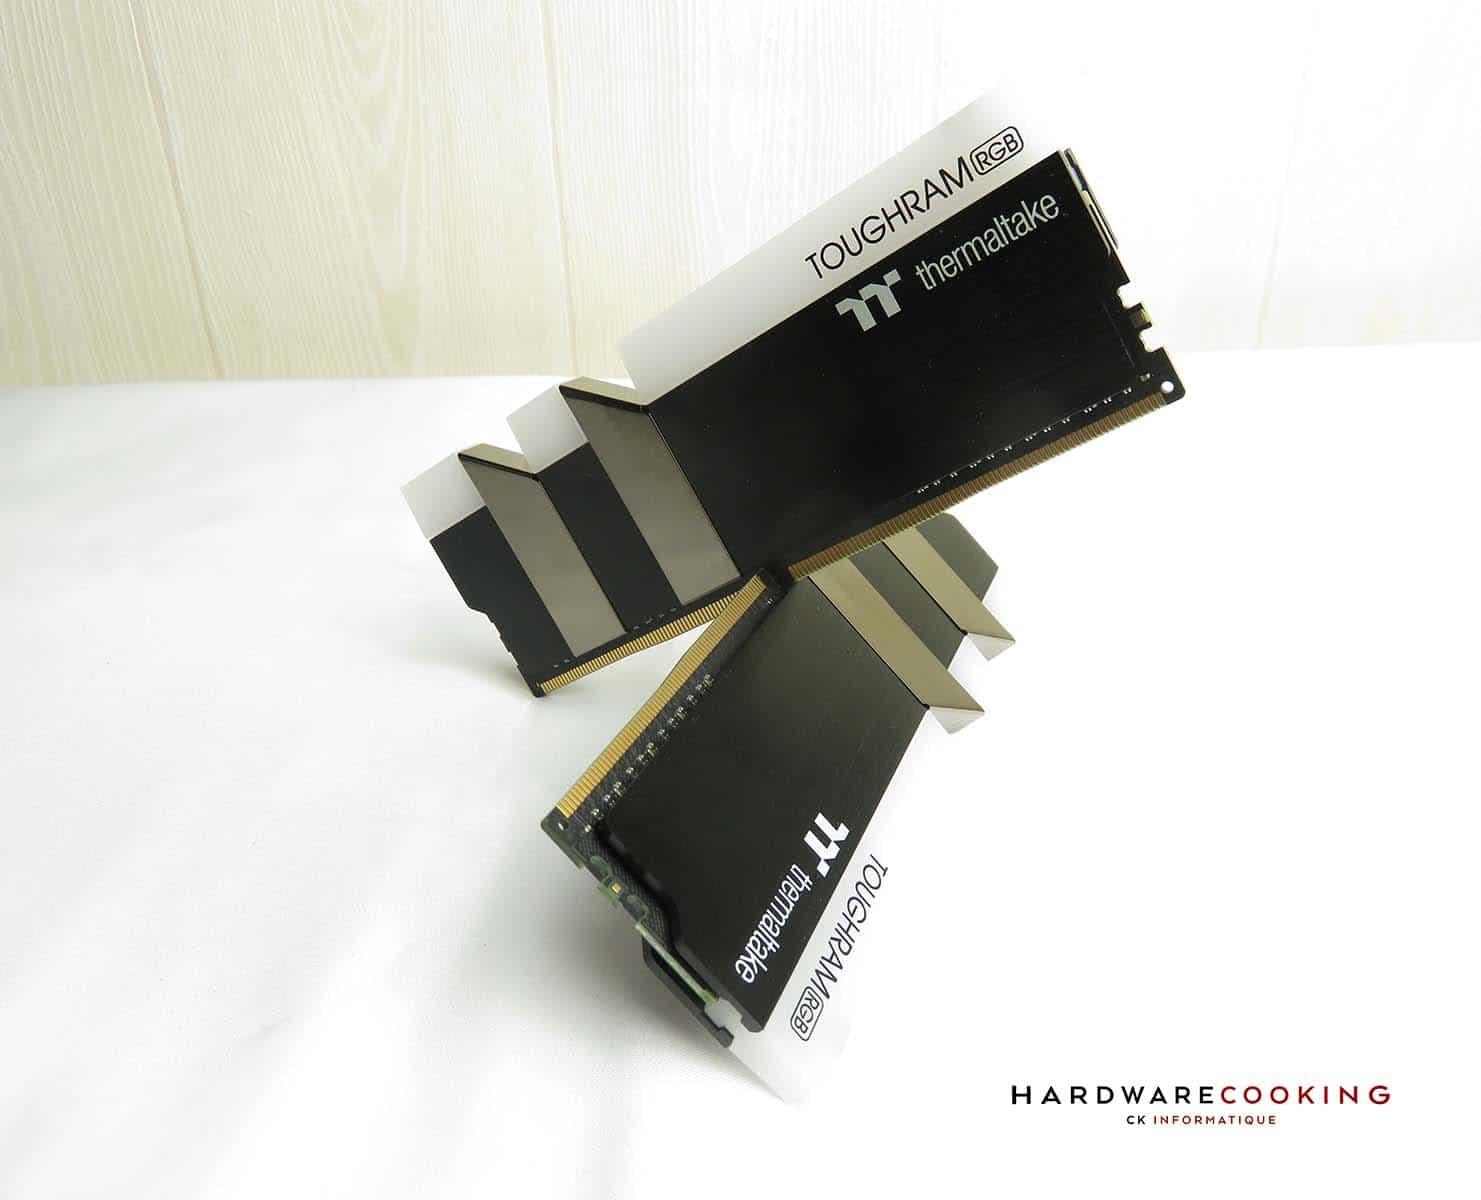 Test Thermaltake Toughram RGB 3600 MHz